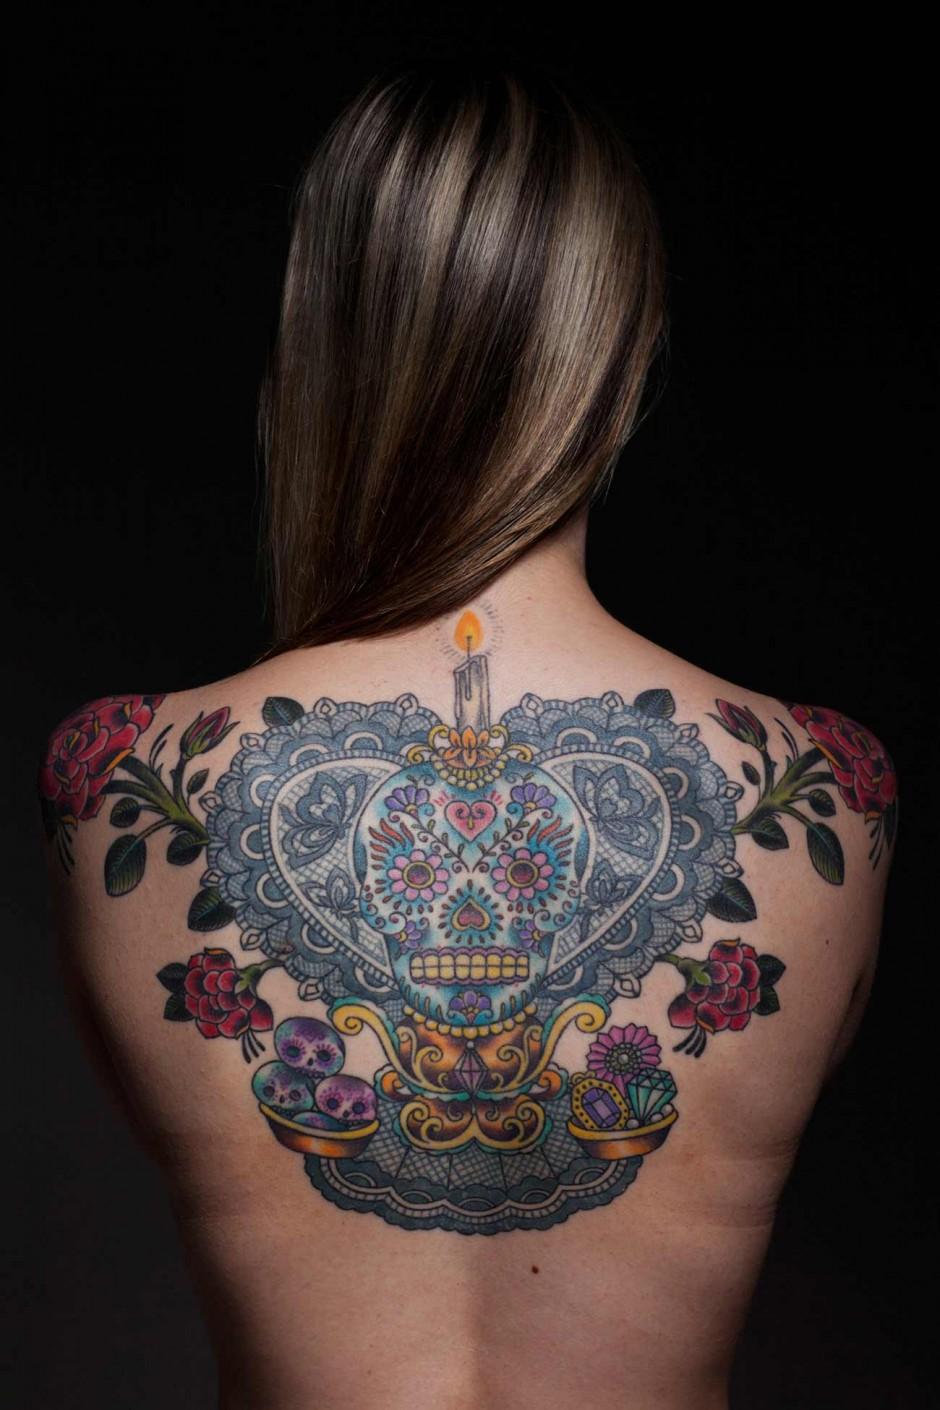 Ashleigh tattooed by Saira Hunjan Foto: Tareq Kubaisi